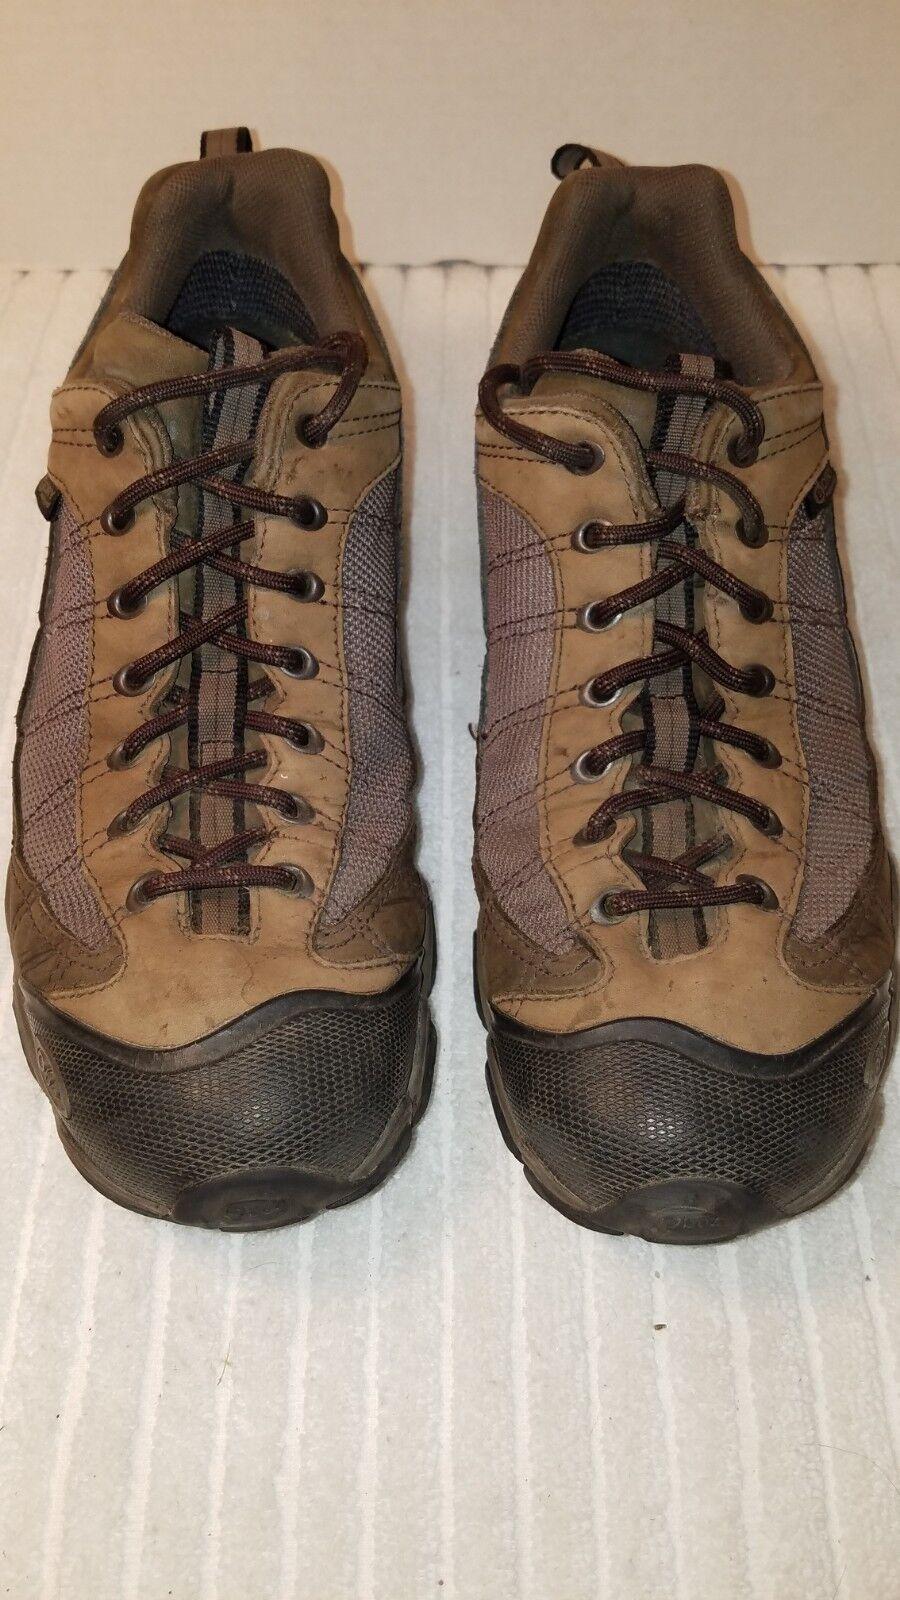 Oboz Mens Firebrand II Bdry Low Hiking shoes Sz 10.5 Umber